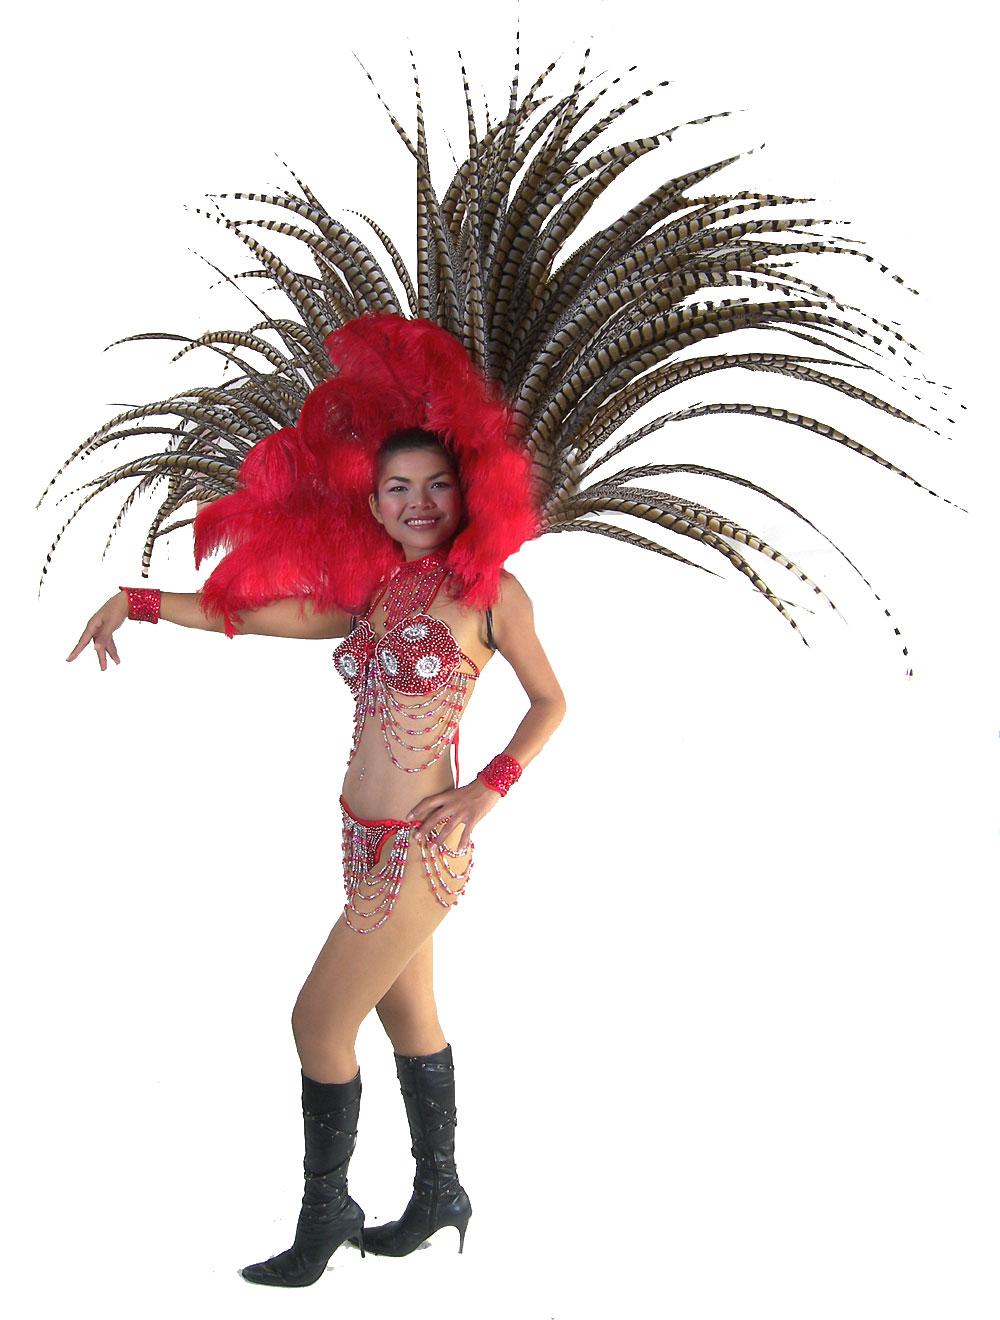 https://michaeljacksoncelebrityclothing.com/stage-cabaret-circus/RT05-feather-harness-costume.jpg